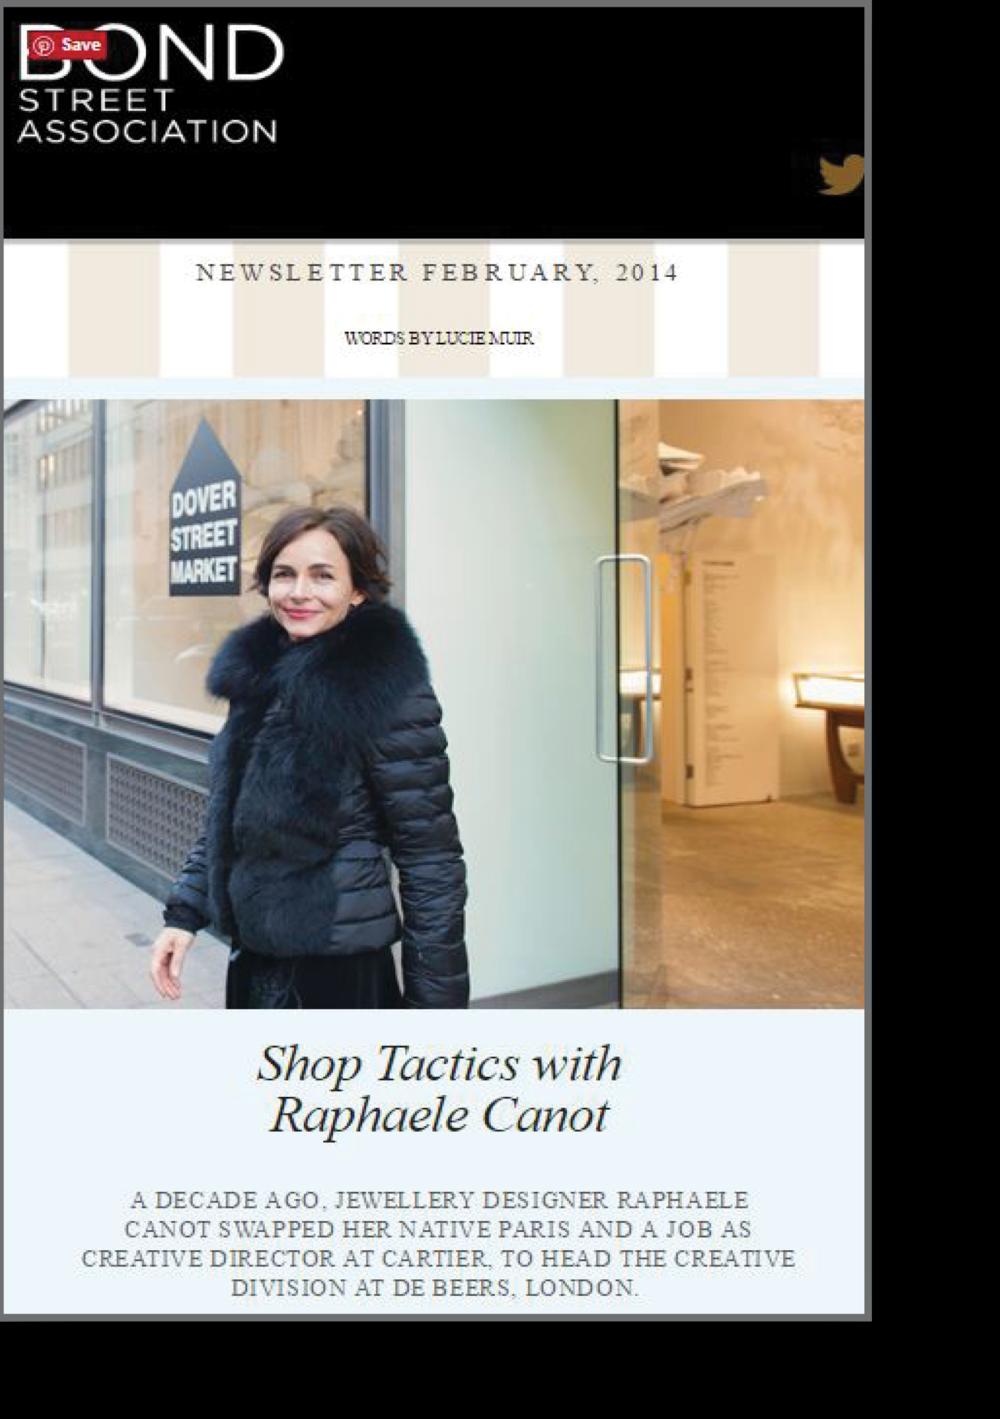 Shop tactics with Raphaele Canot